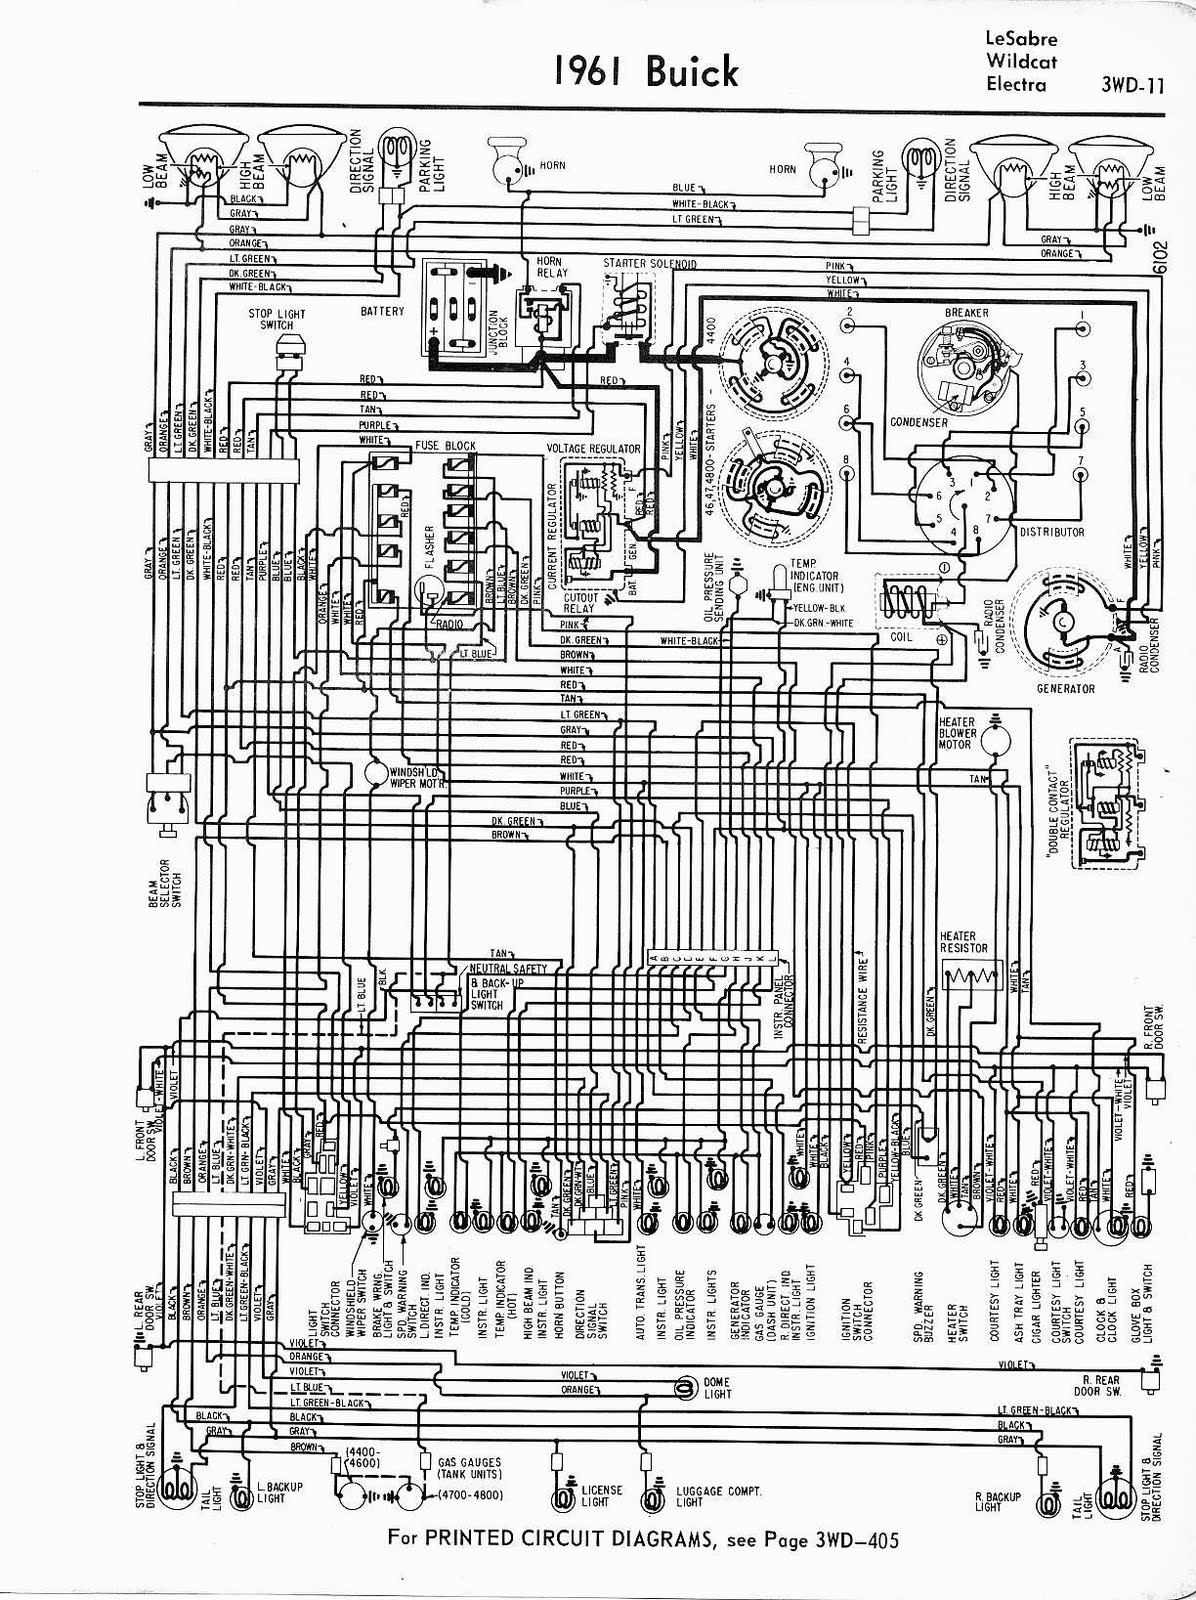 Free Auto Wiring Diagram: 1961 Buick LeSabre, Wildcat ...